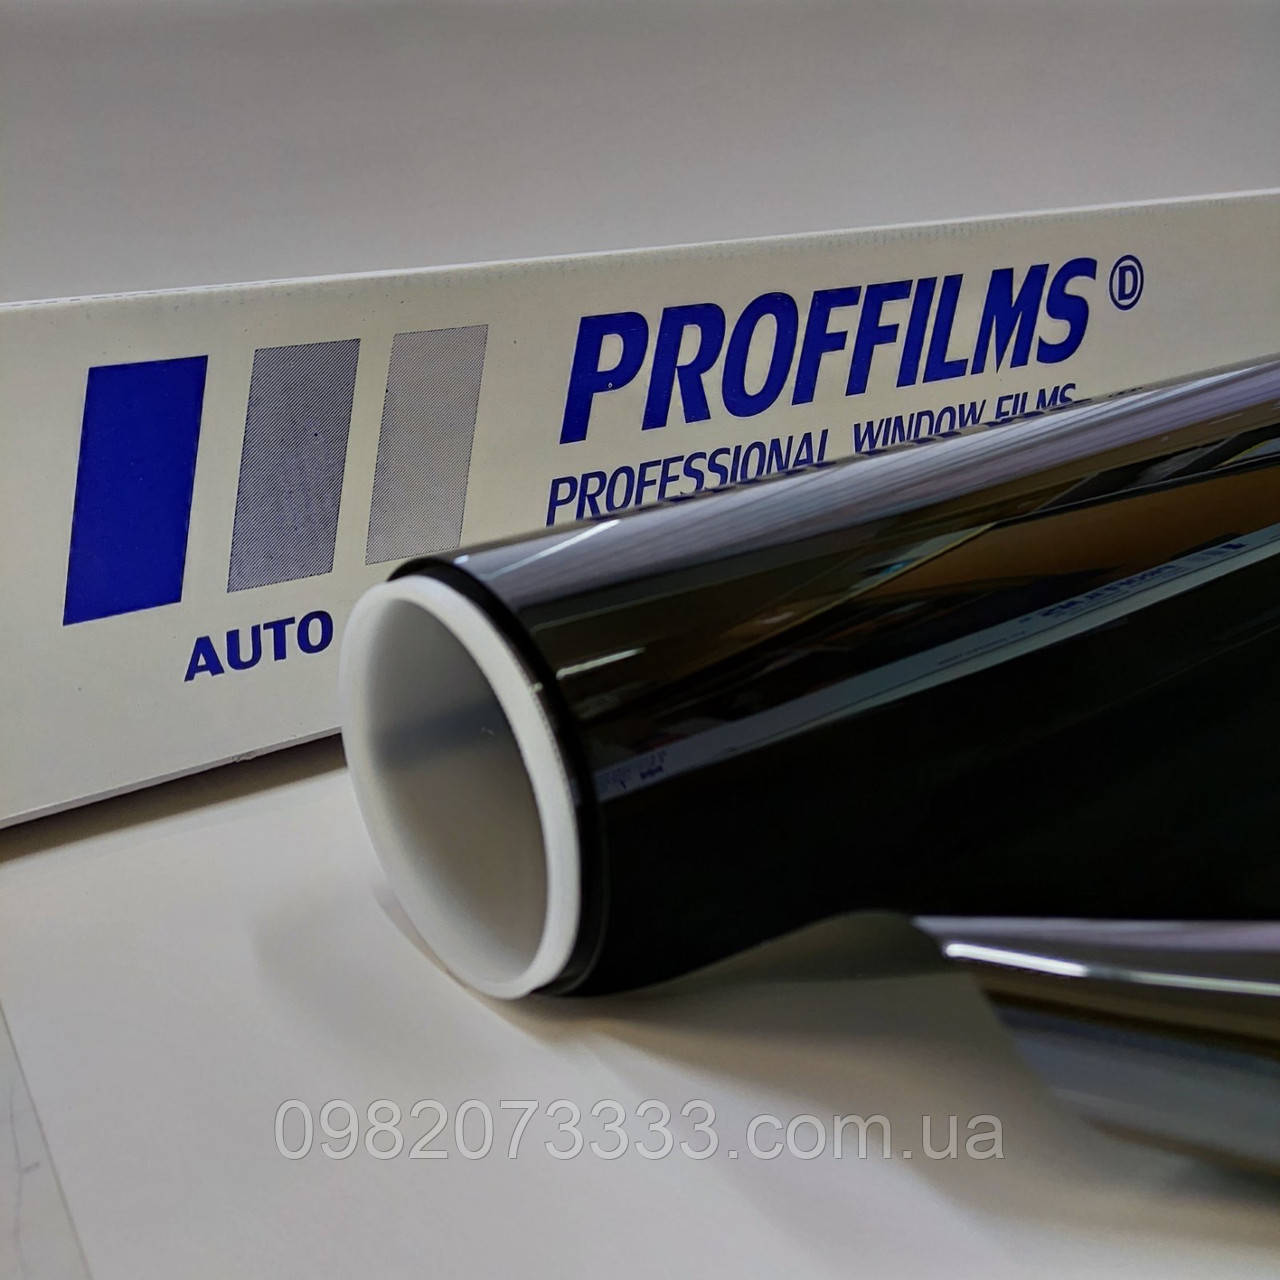 Автомобильная пленка PR CH 05% керамическая для авто. Плівка тонувальна ширина рулона 1,524 (цена за кв.м)